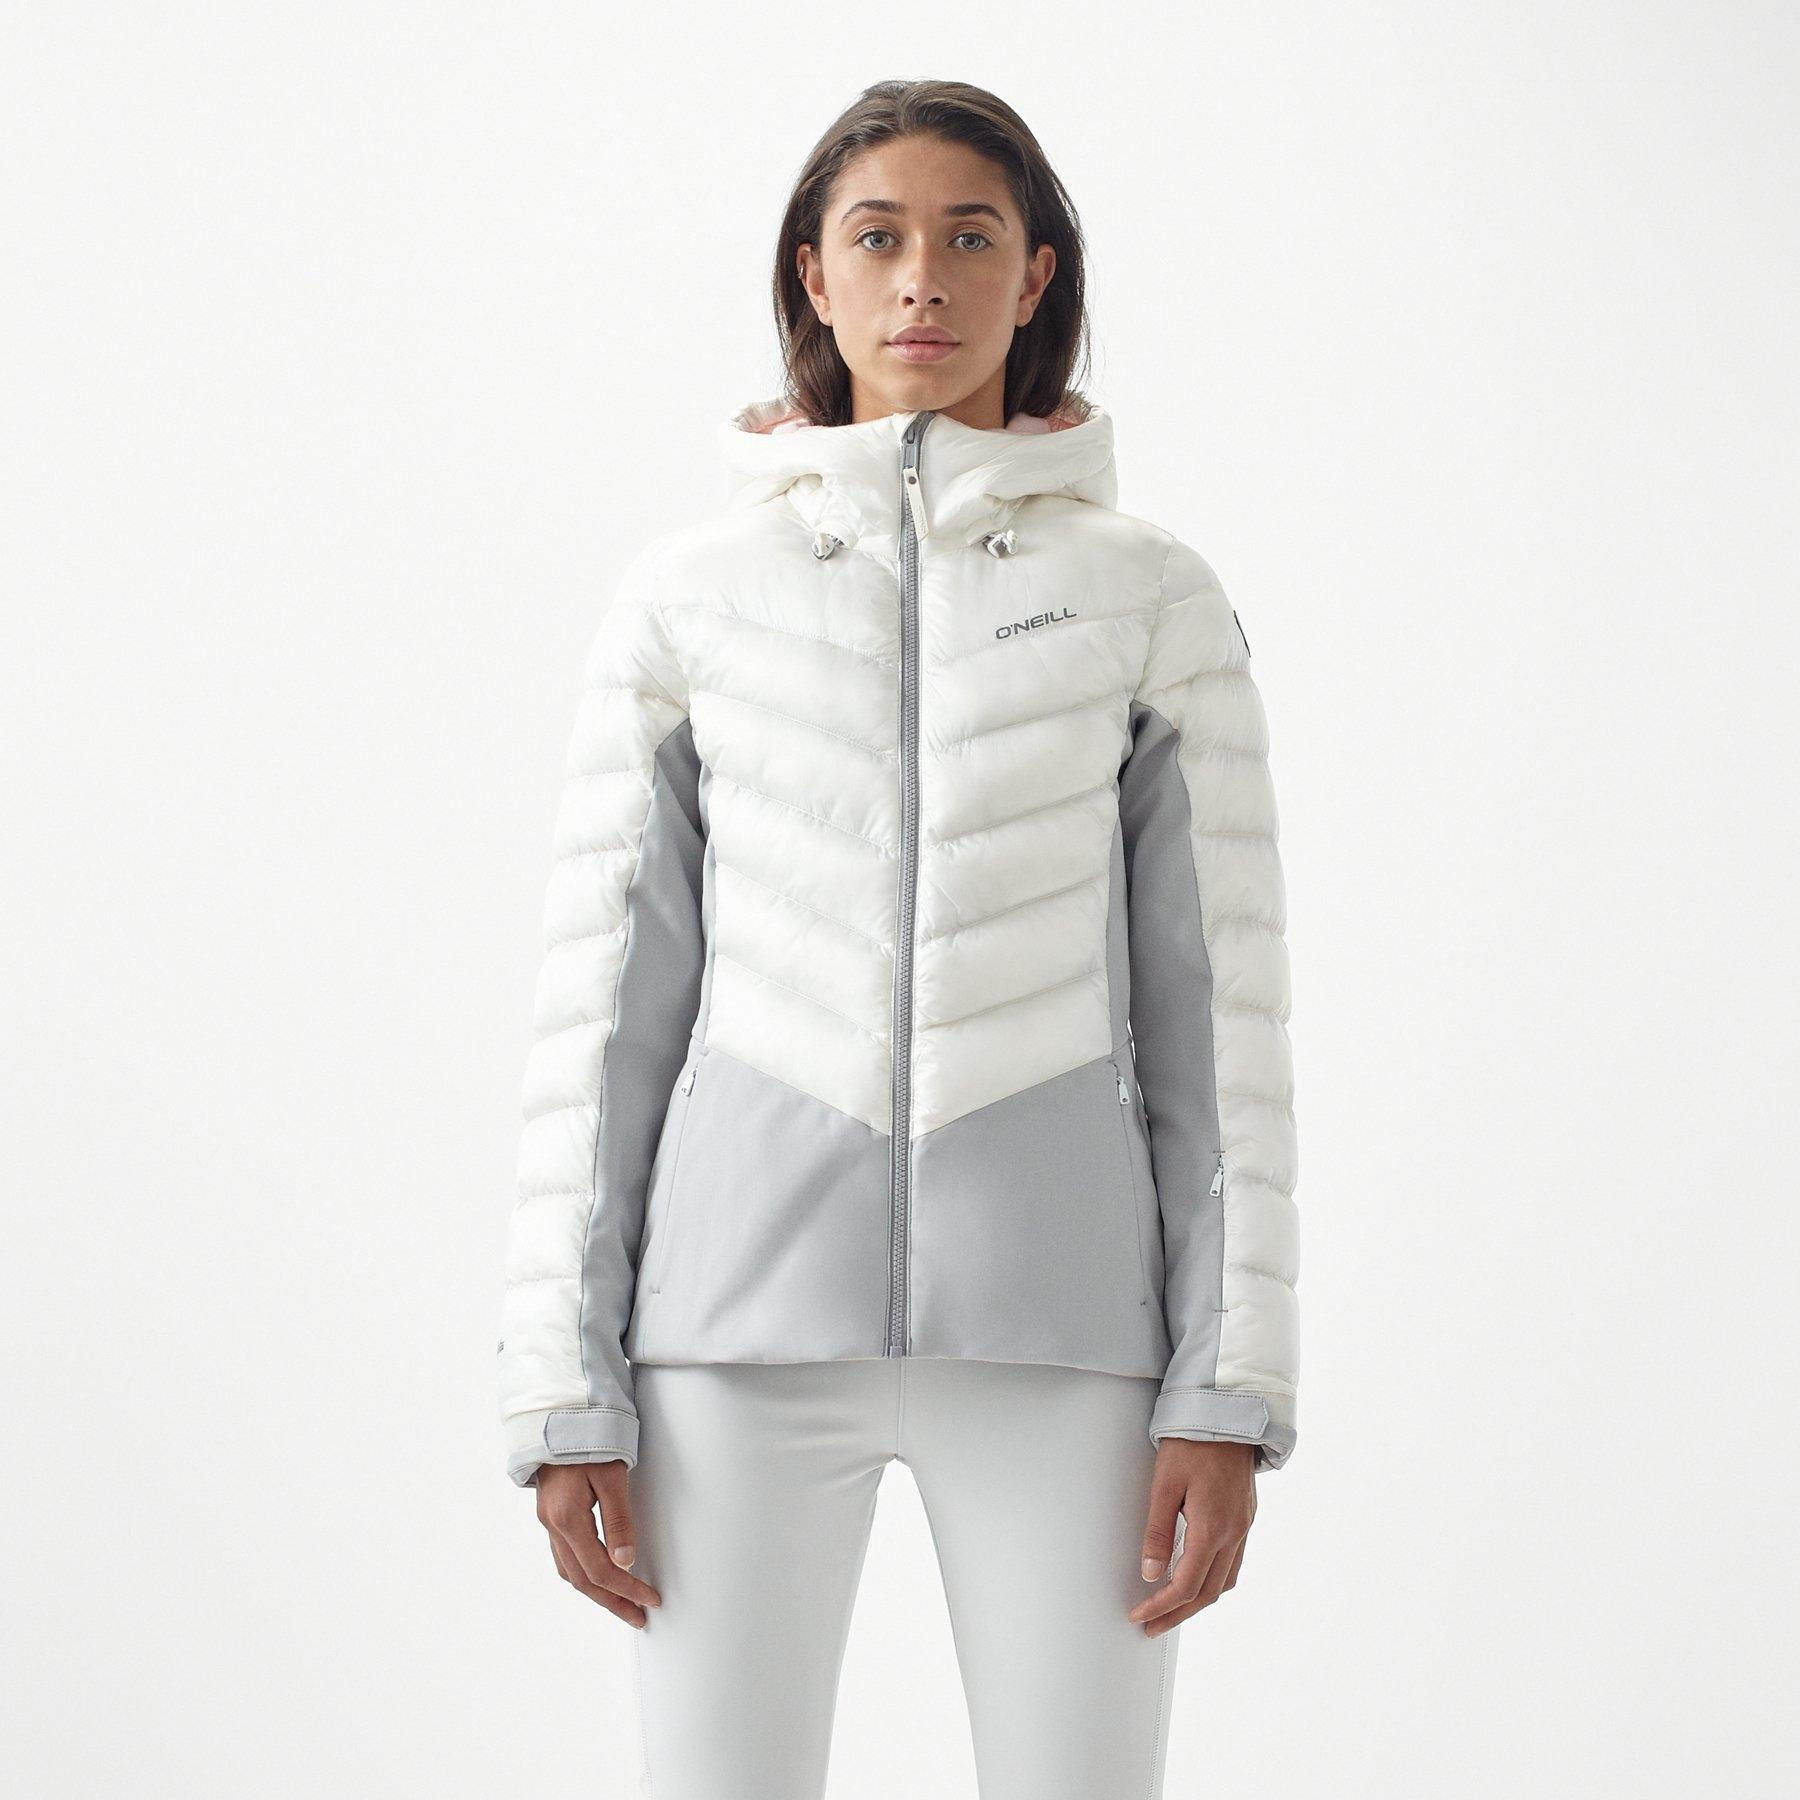 O'neill Ski jas »Virtue« online kopen op otto.nl